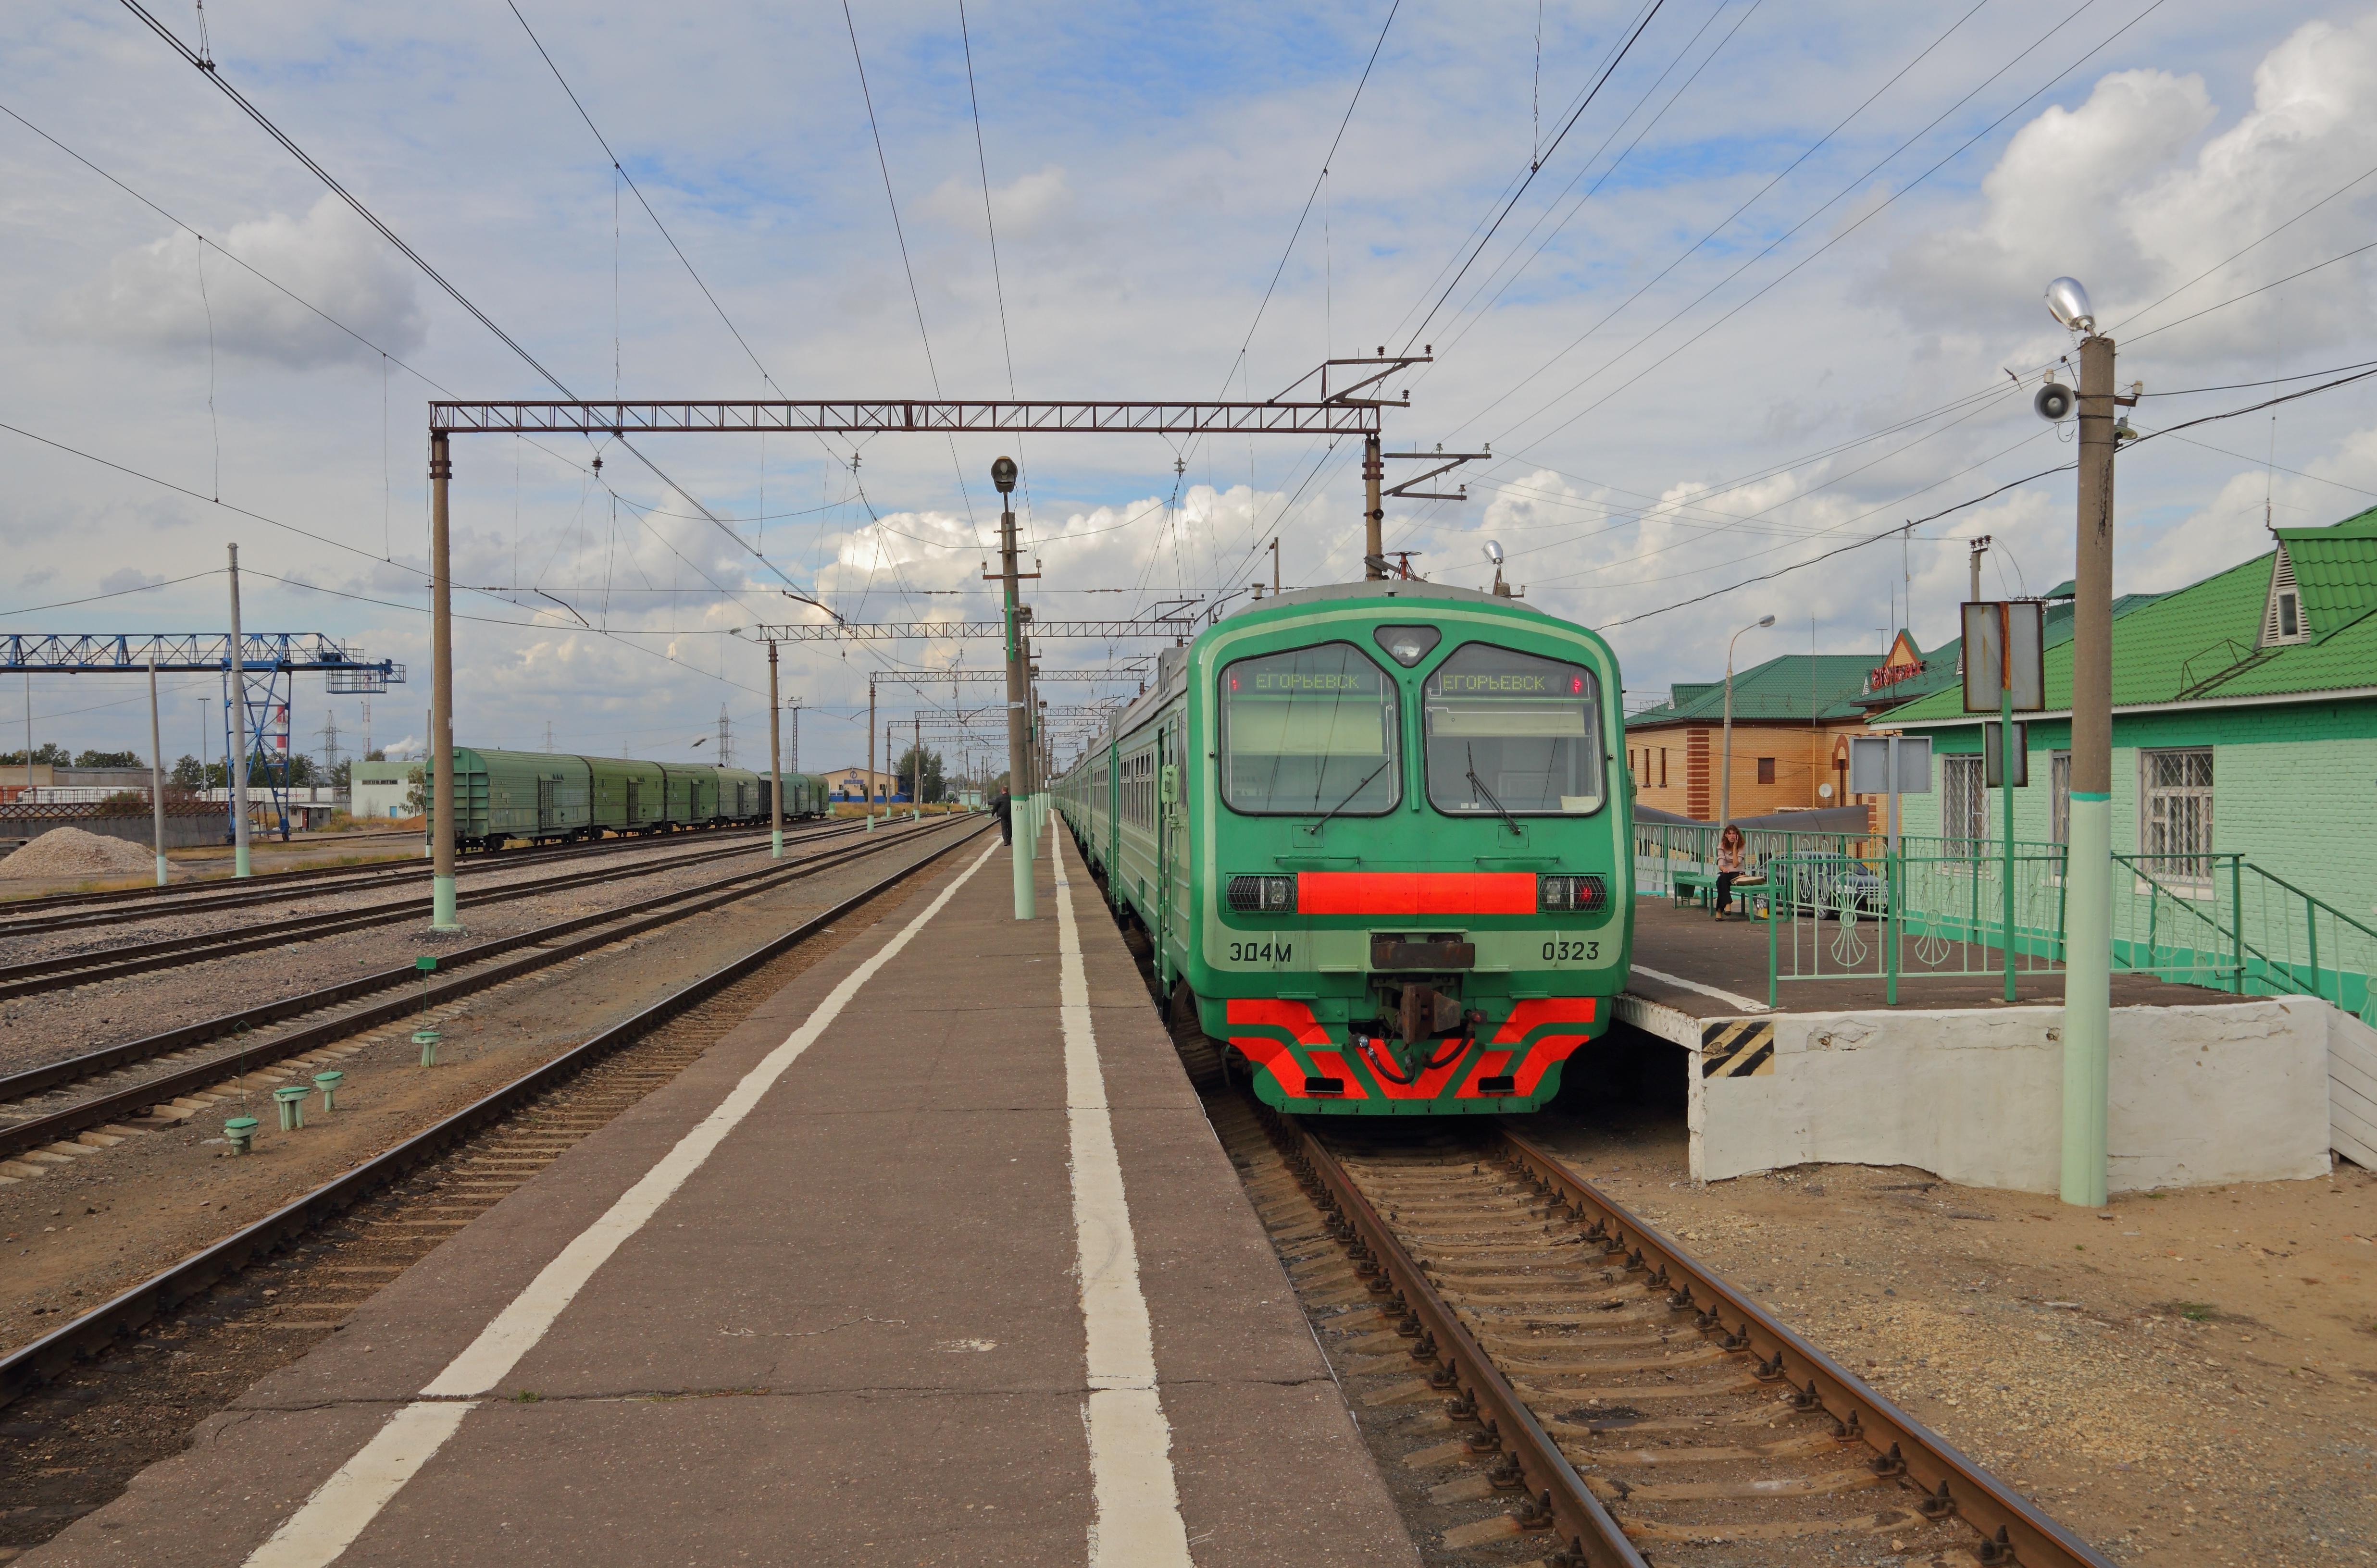 Yegorievsk_Aug12_various_01_-_train_station.jpg